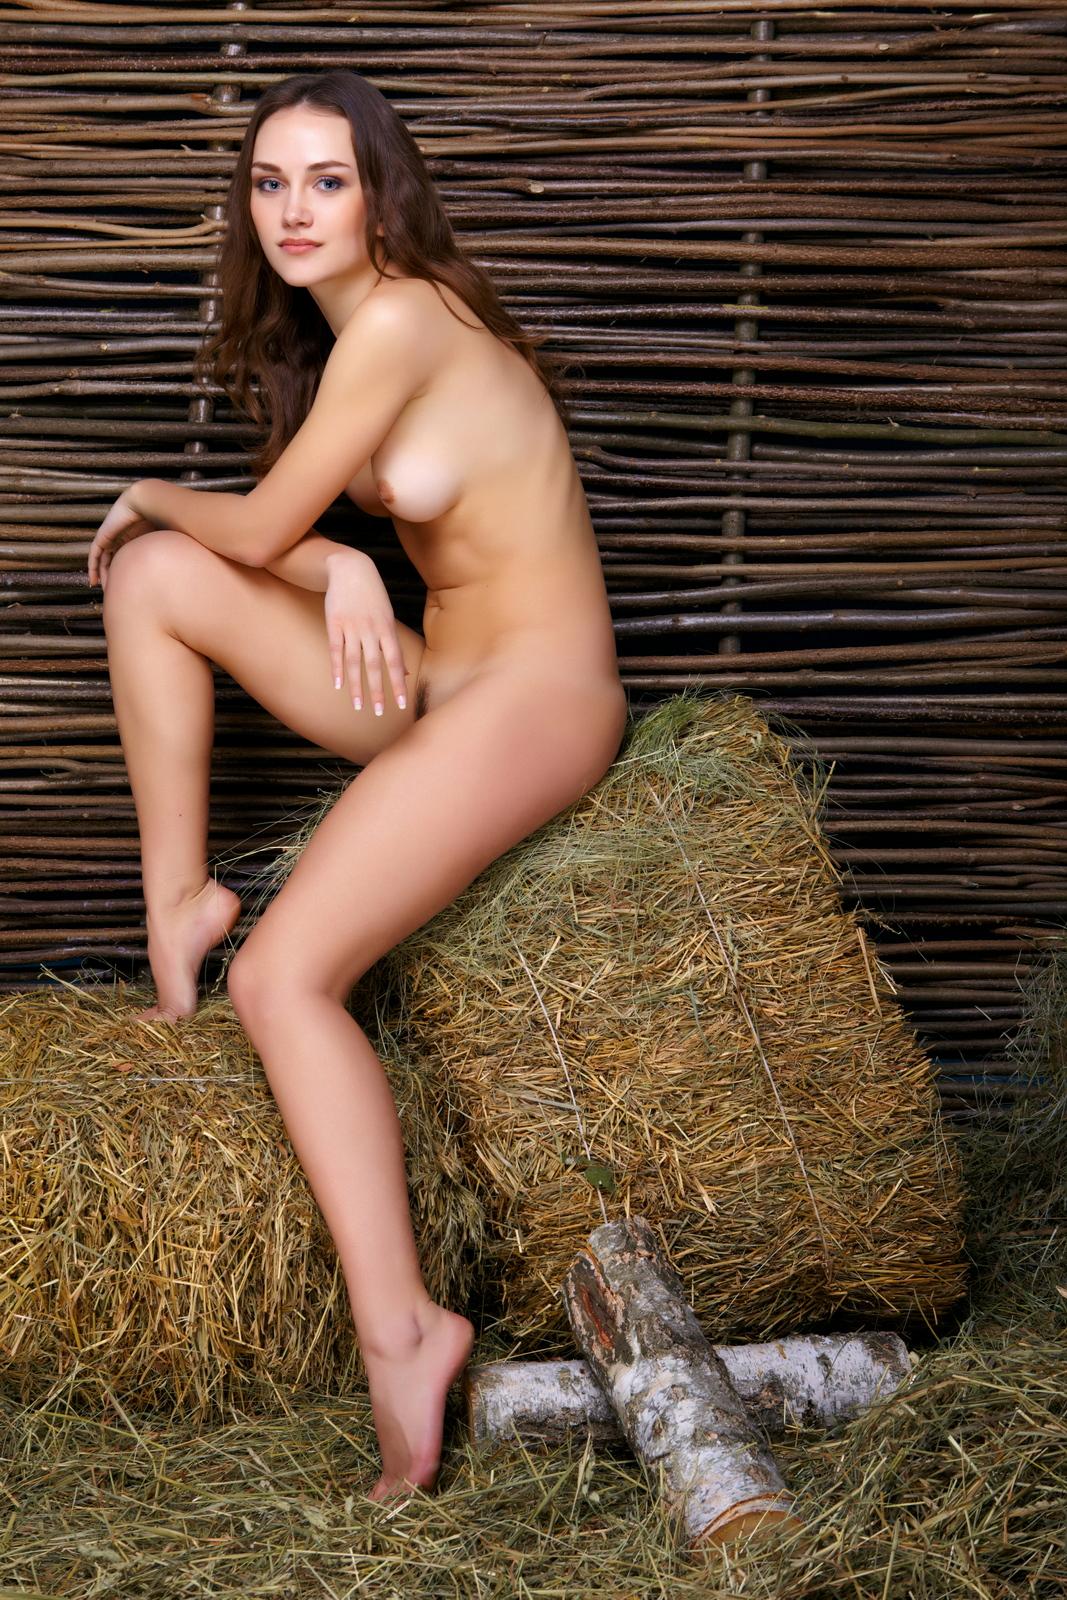 zlatka-a-nude-on-hay-barn-pussy-metart-15